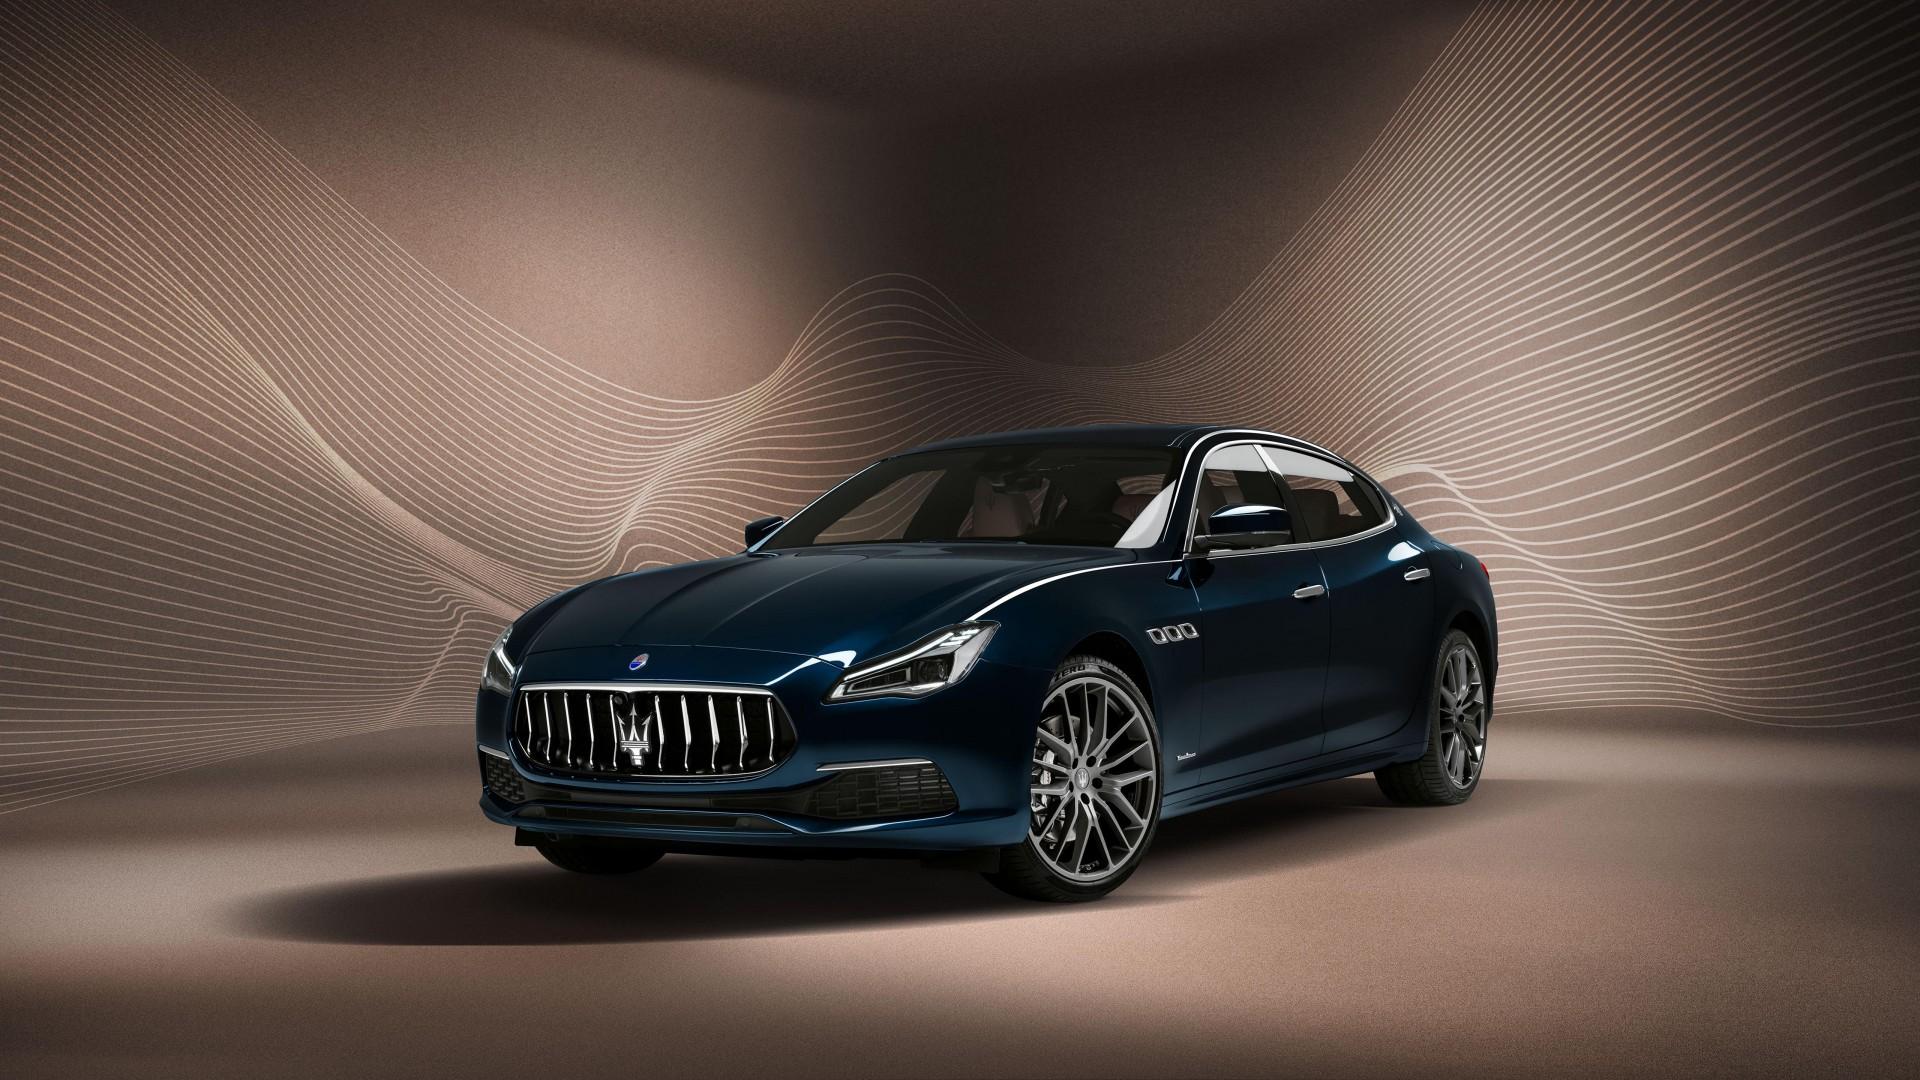 Maserati Quattroporte GranLusso Royale 2020 5K HD desktop 1920x1080